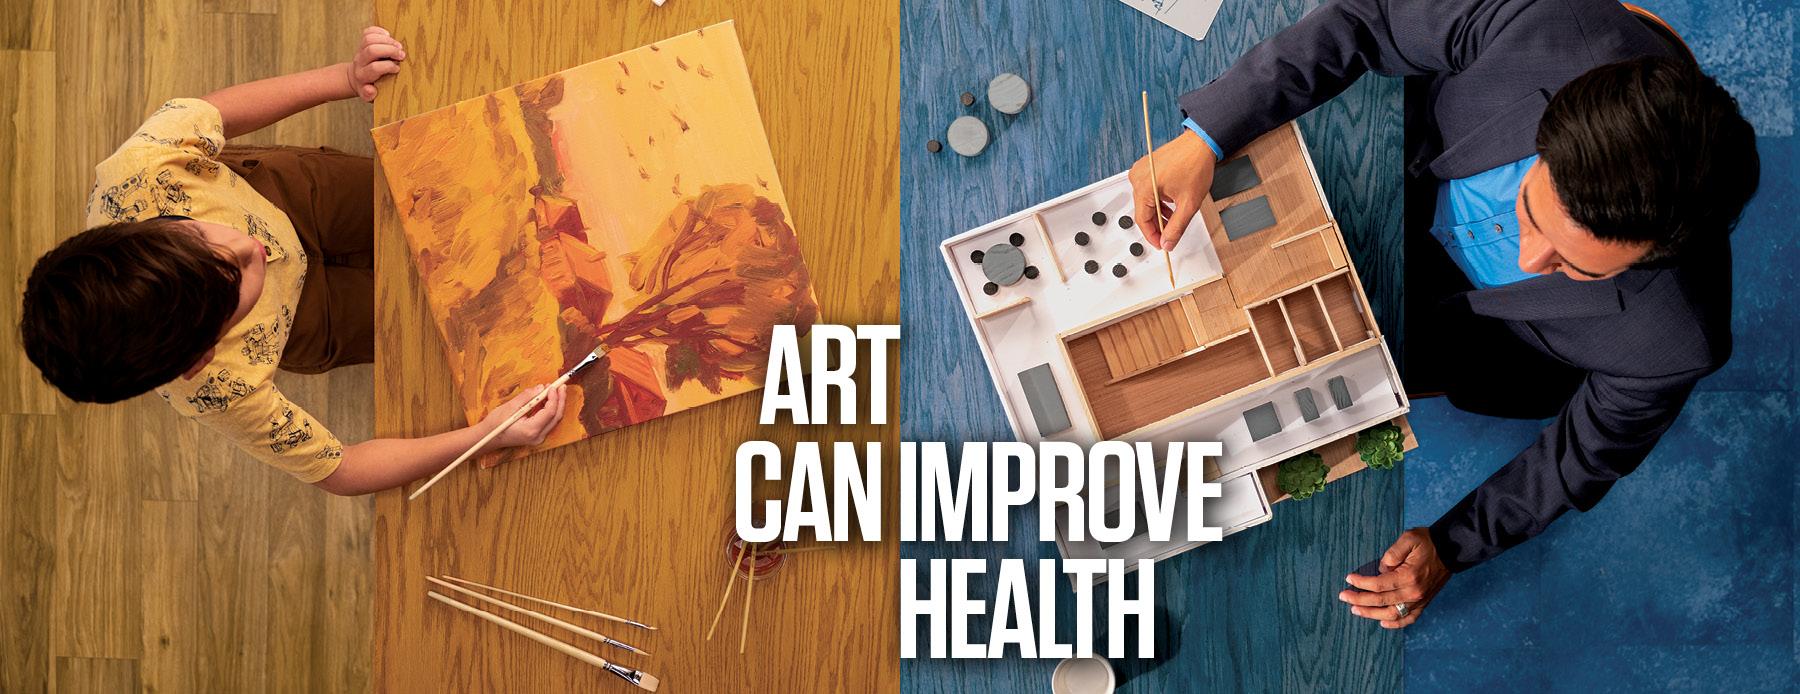 Art Can Improve Health